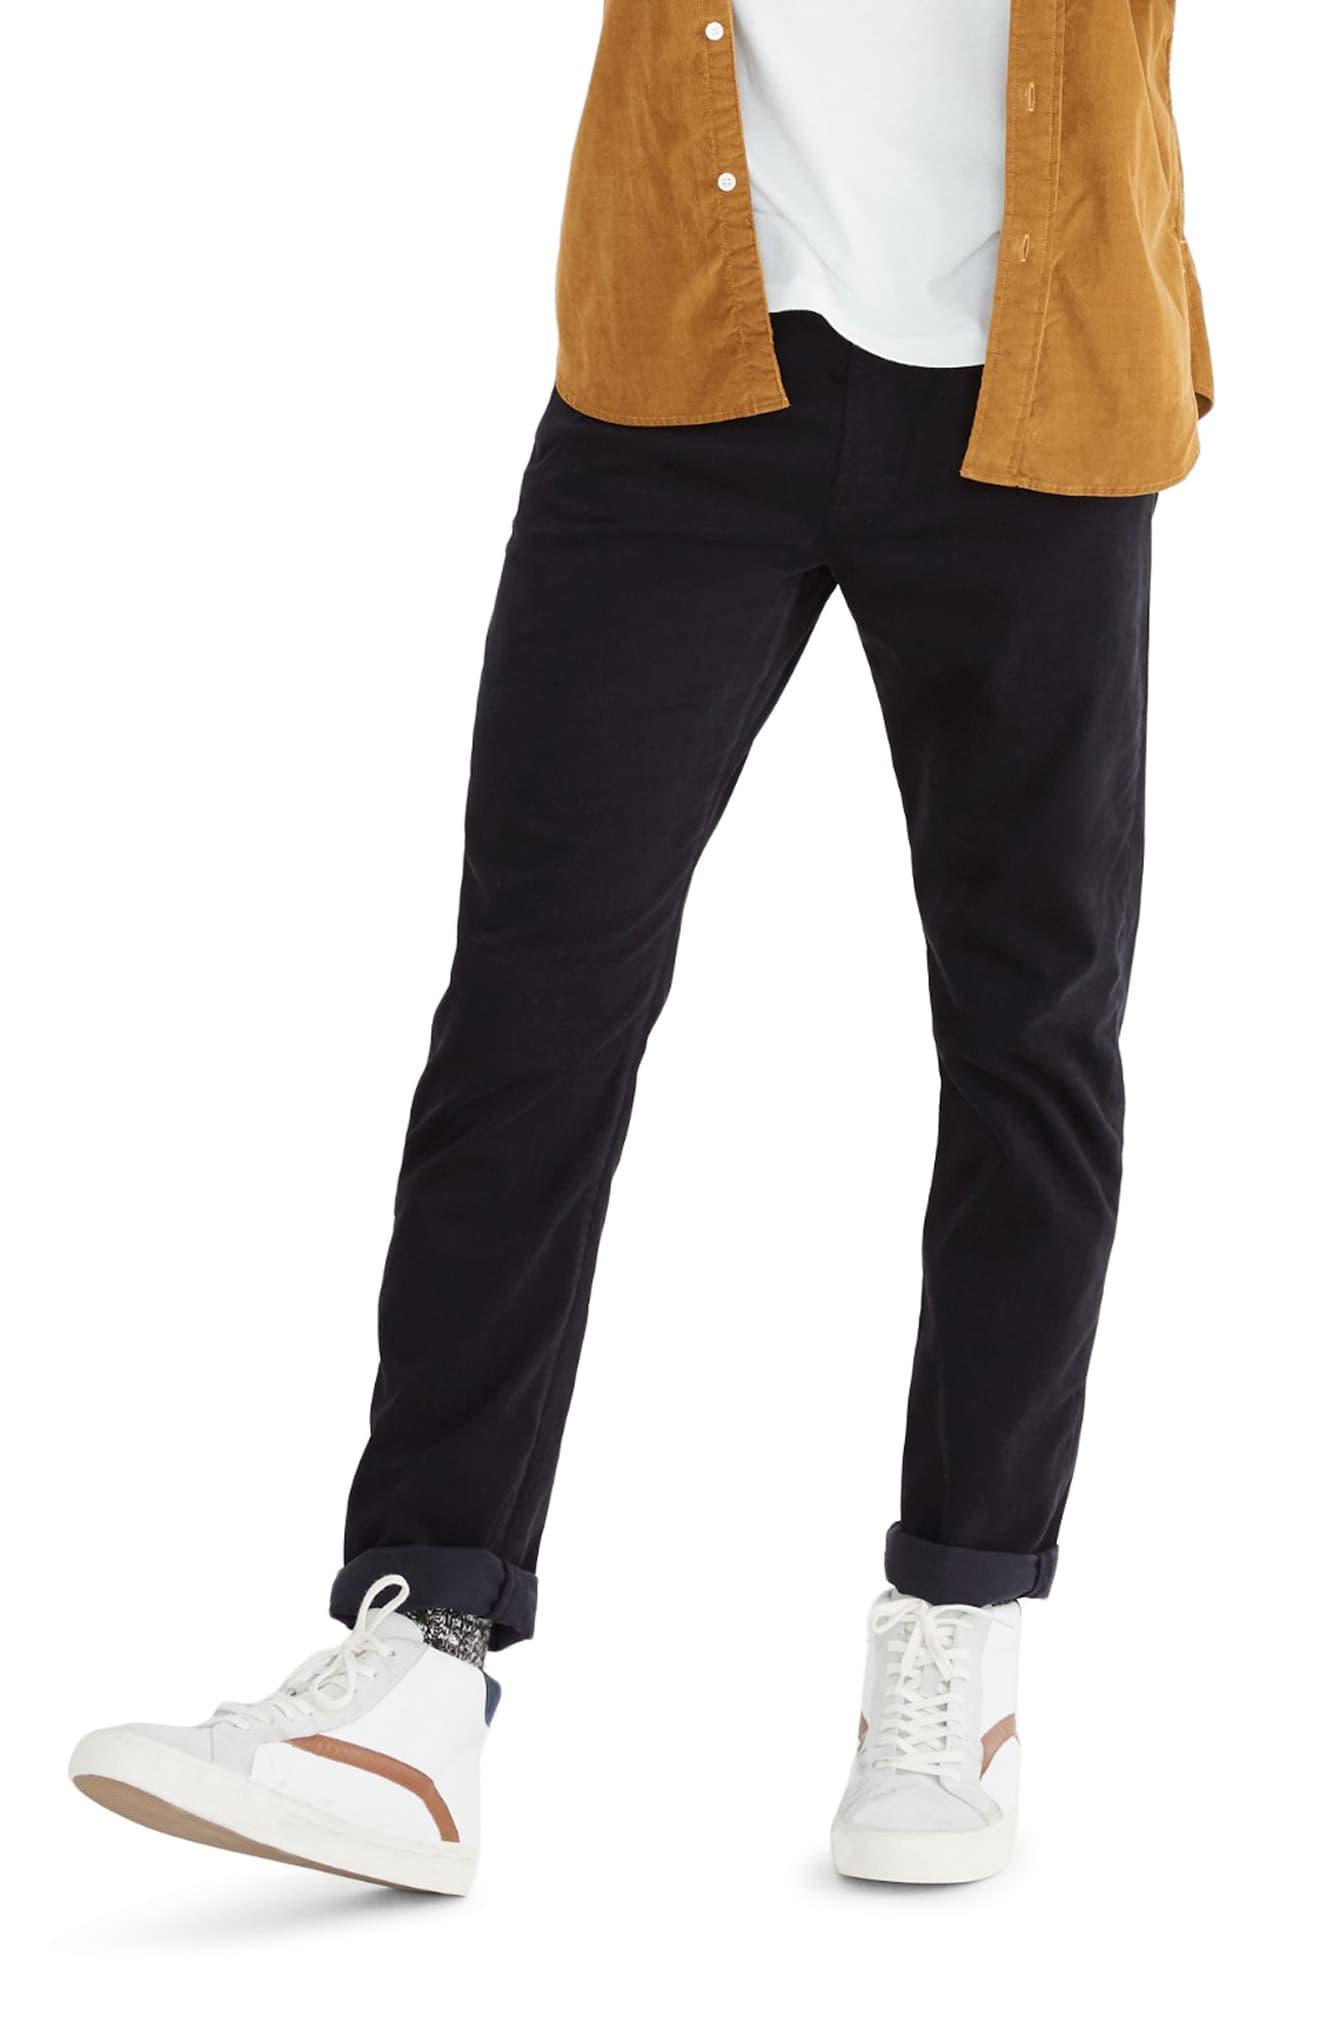 Men's Madewell Sateen Slim Jeans, Size 29 x 32 - Black